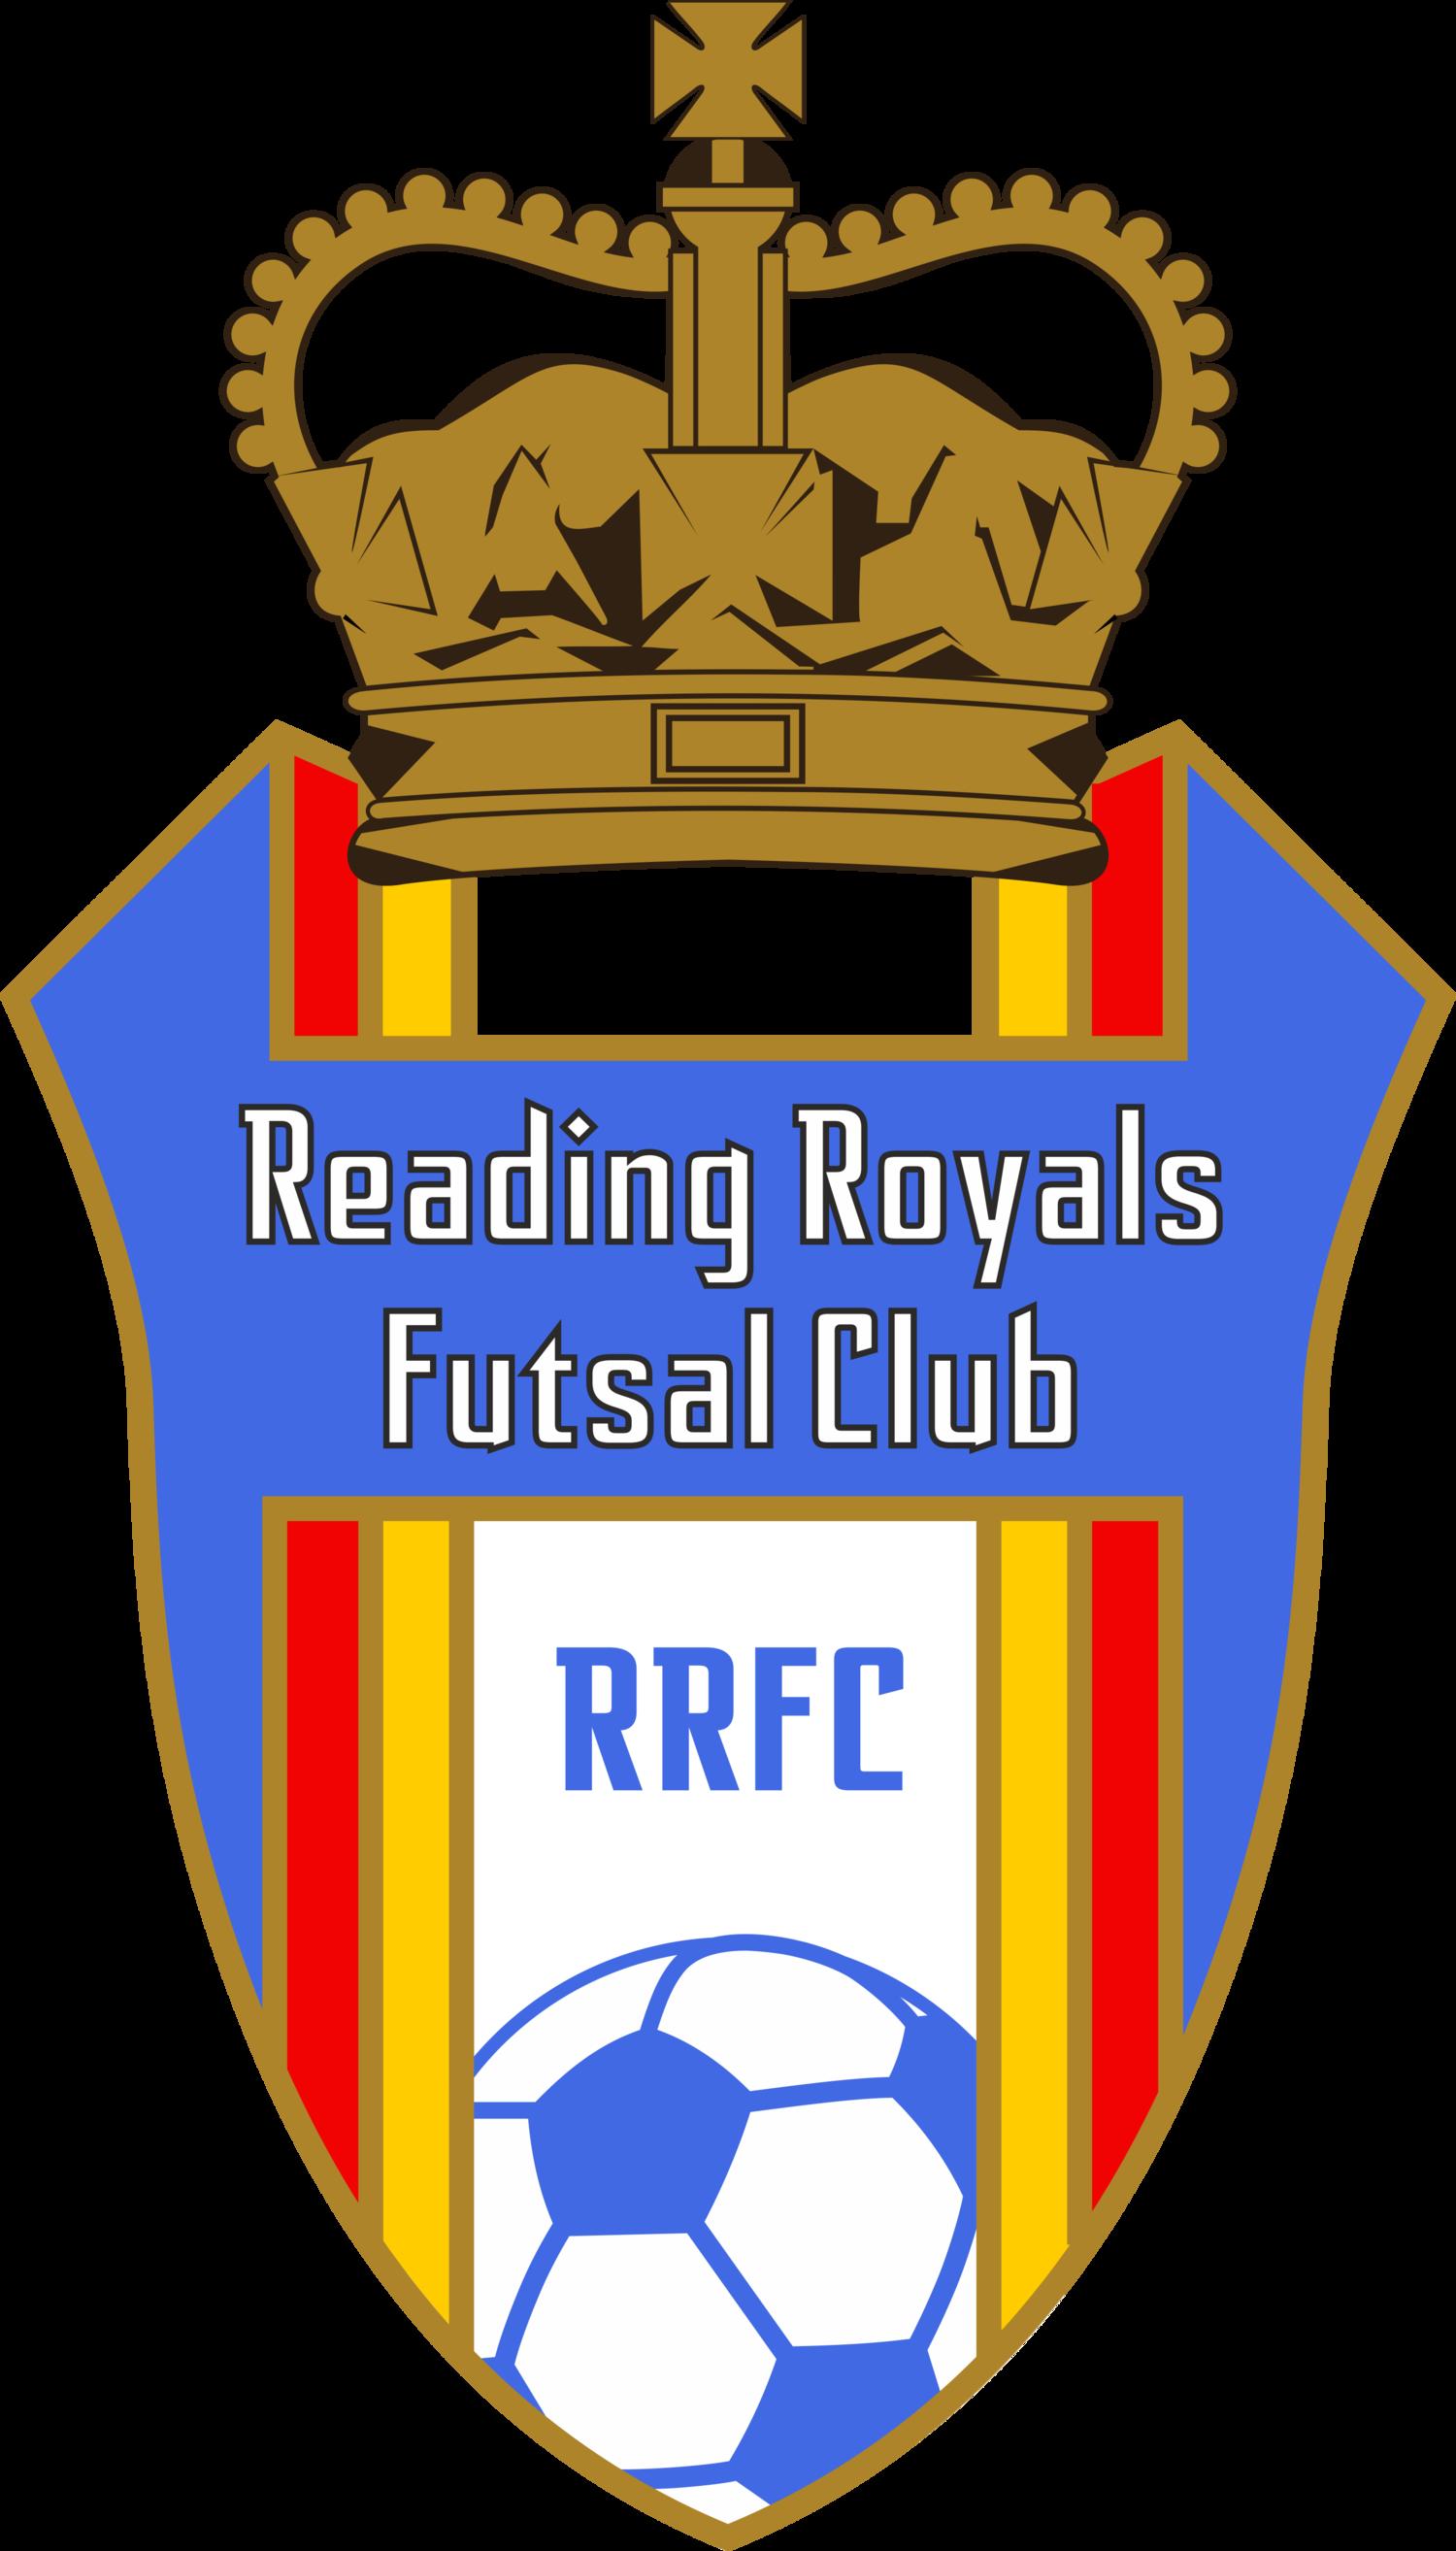 Reading Royals Futsal Club